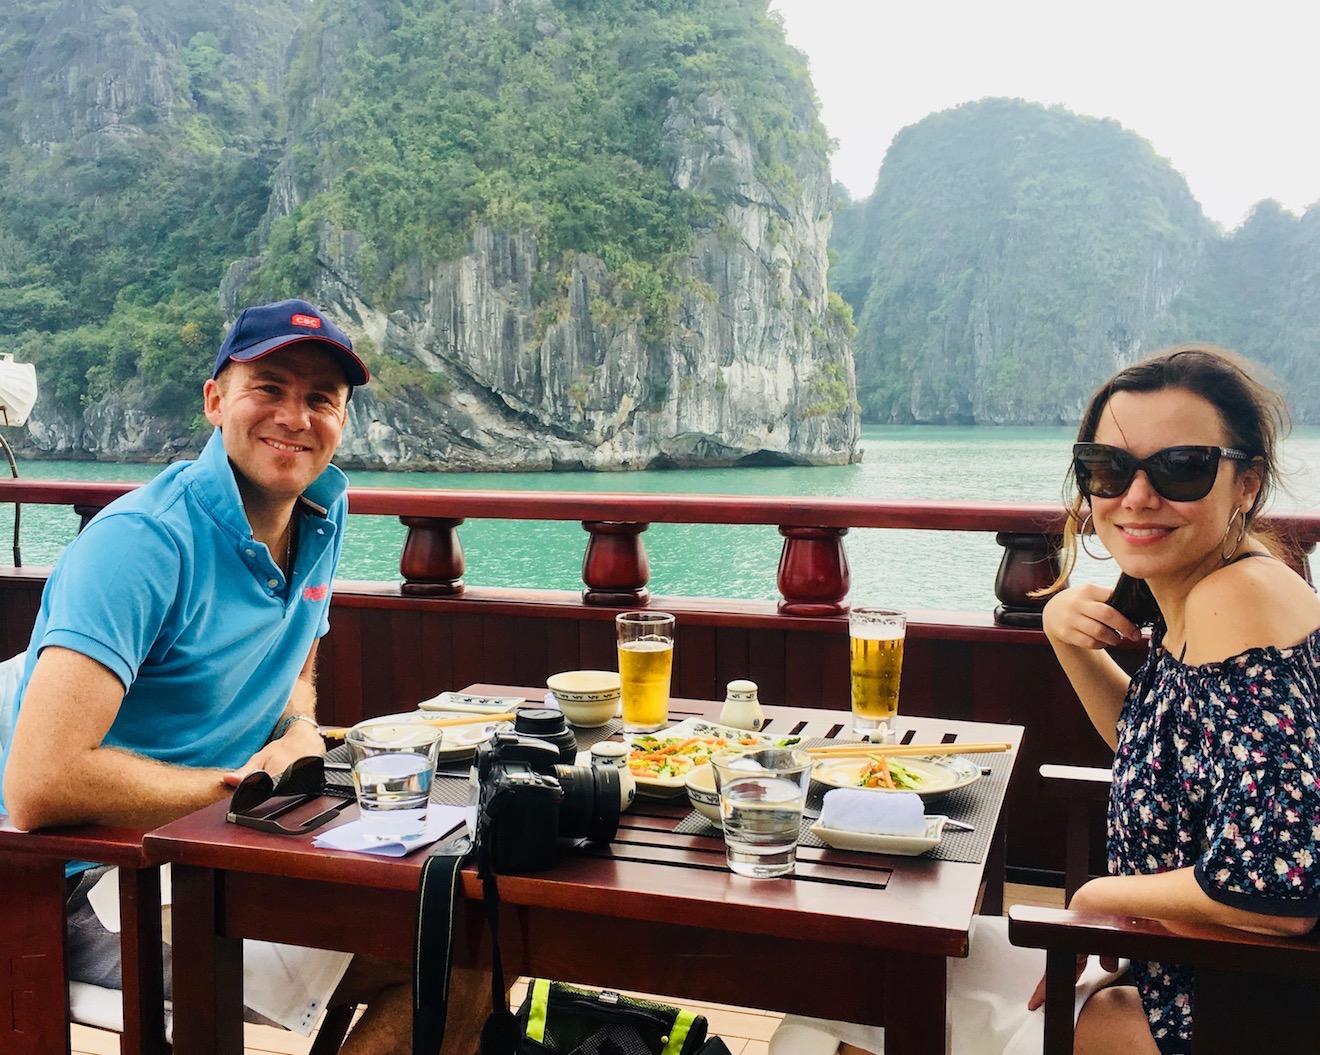 3-Day cruise in Bay Tu Long, Vietnam. Photo: Patti Neves